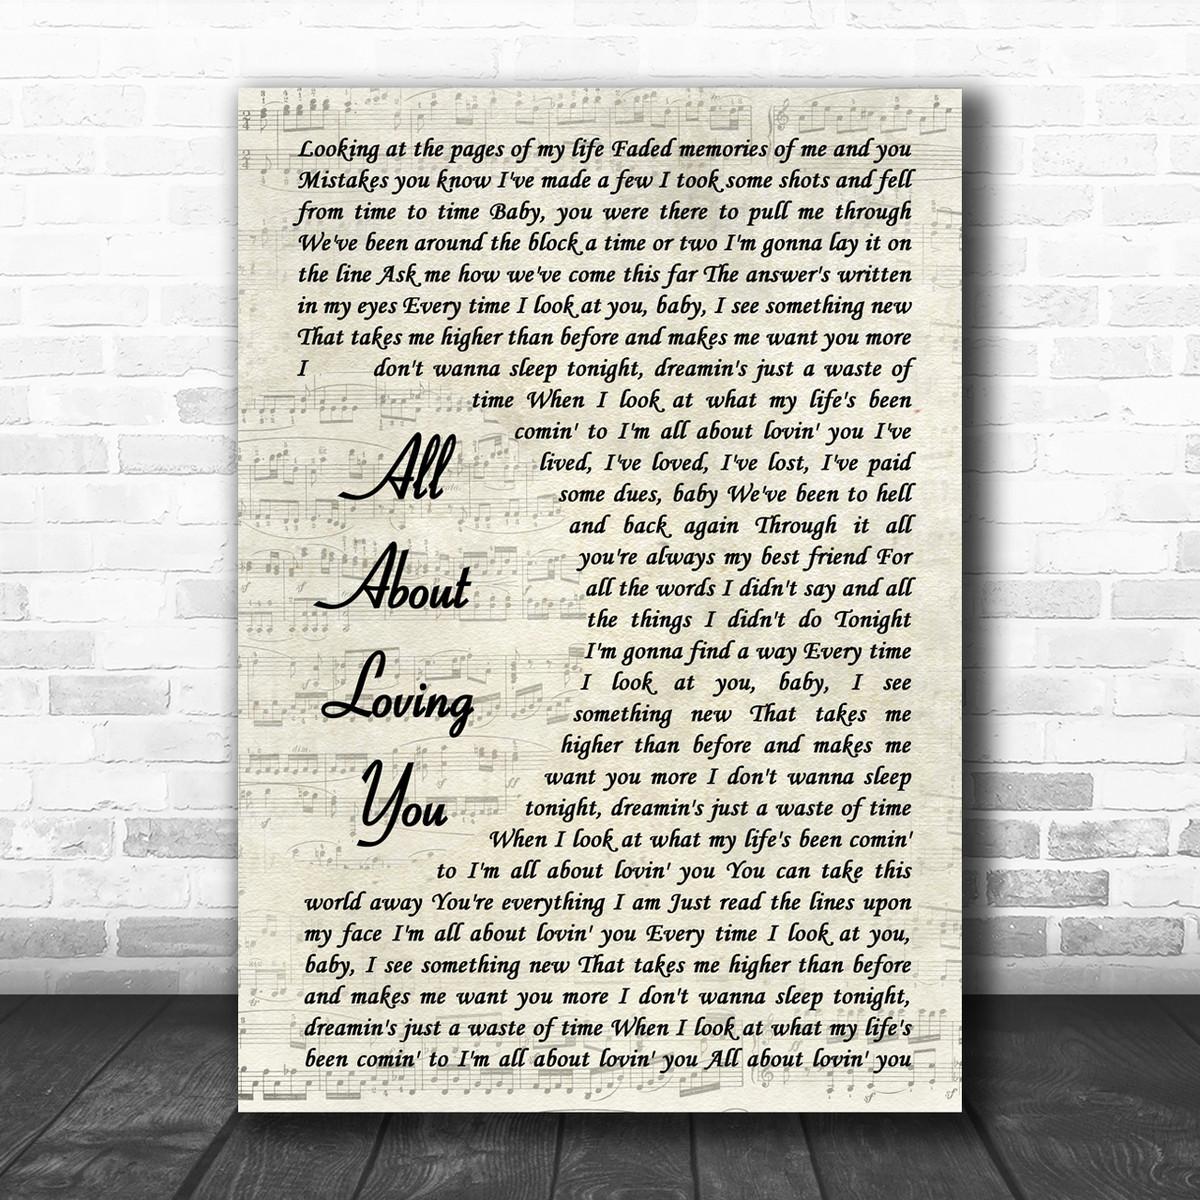 Bon Jovi All About Loving You Vintage Script Song Lyric Music Wall Art Print